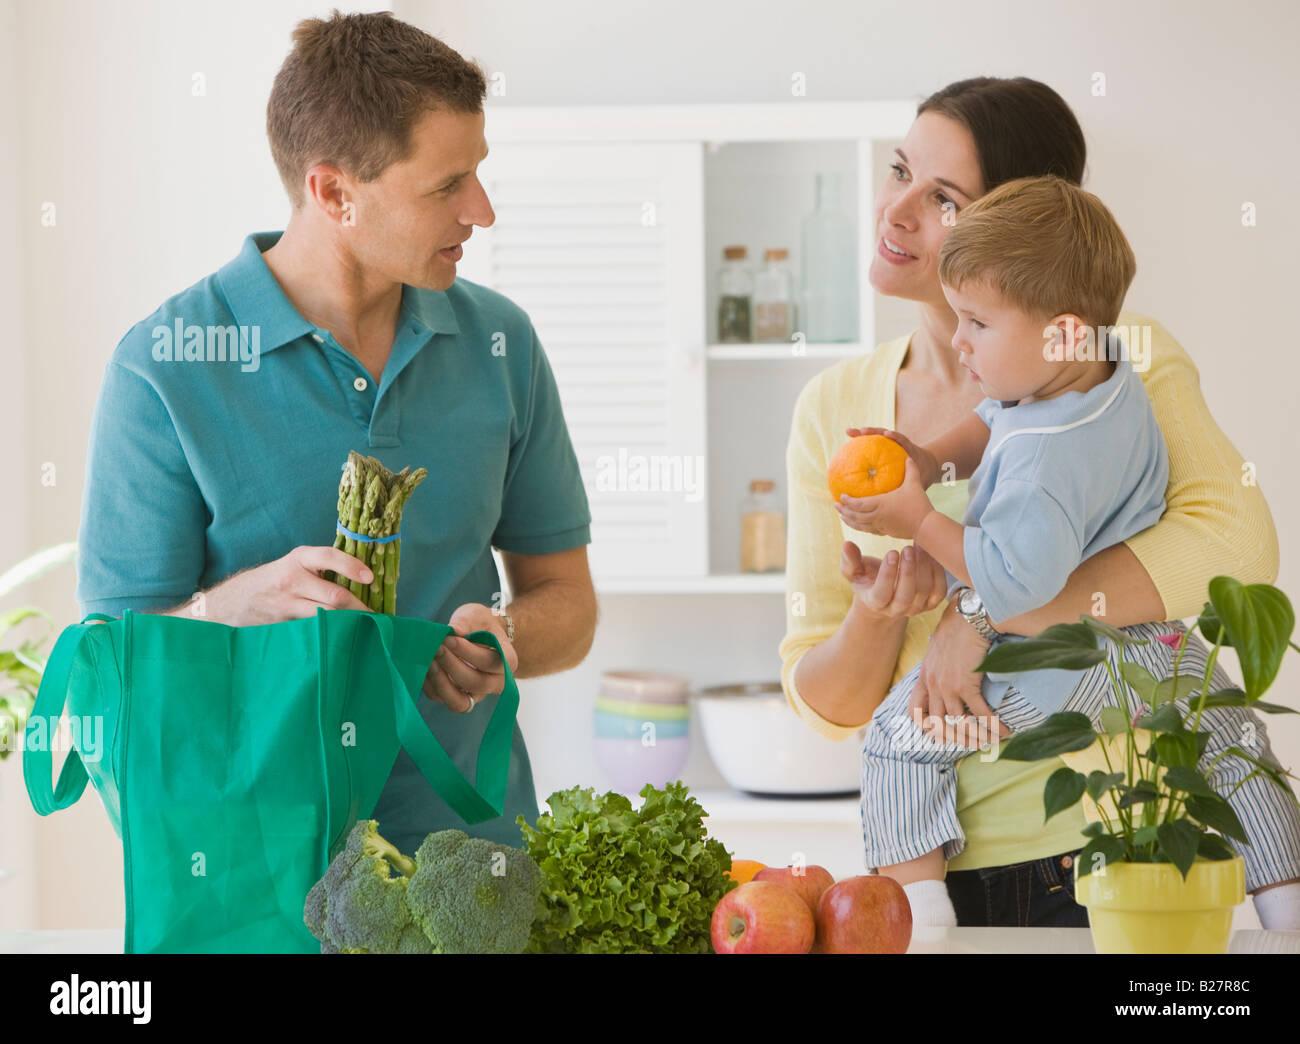 Familia desempaquetar comestibles Foto de stock